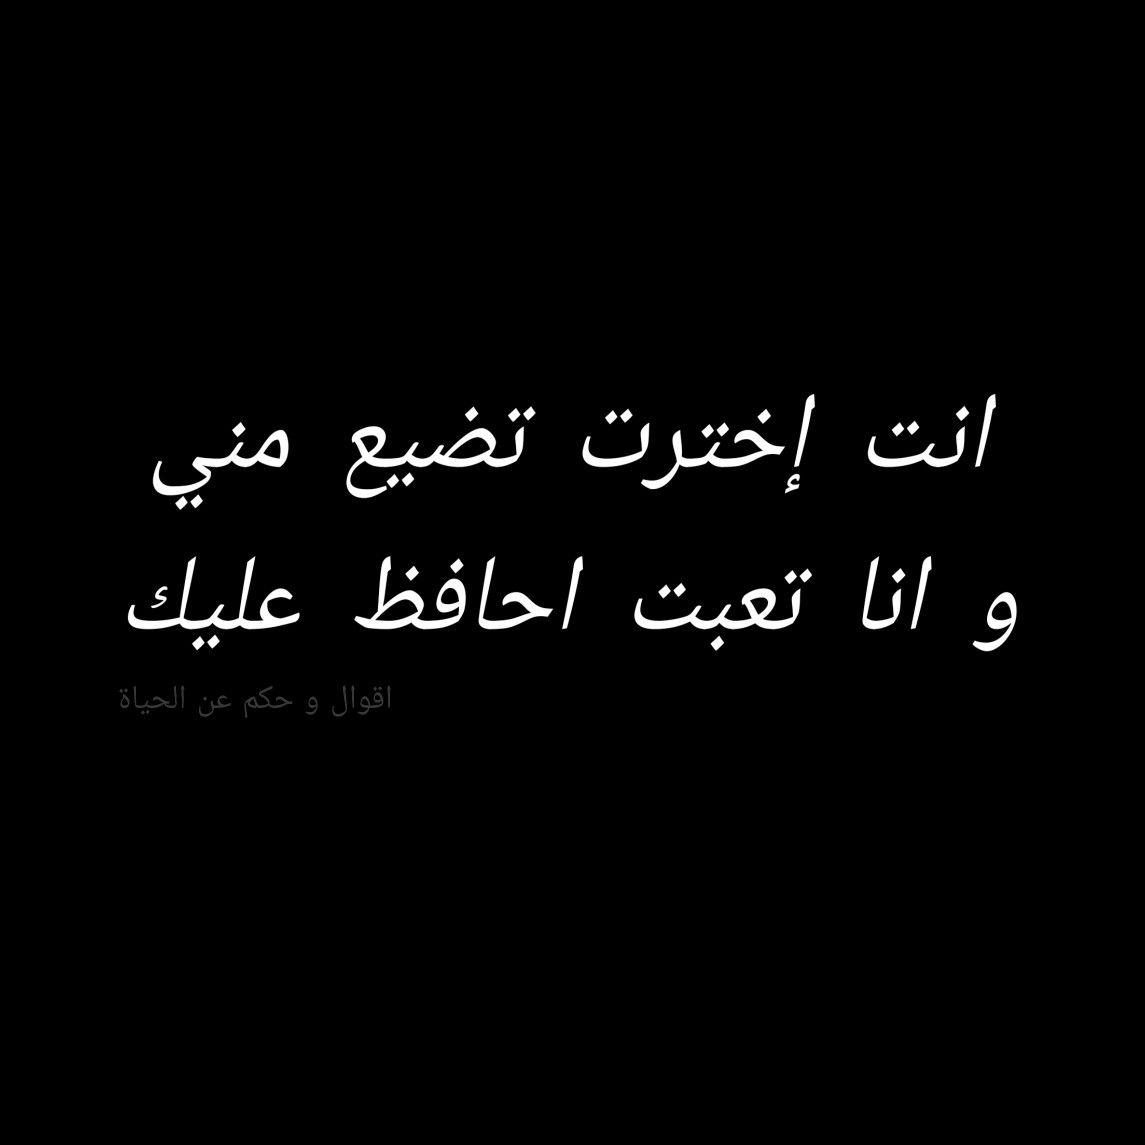 Pin By اقوال و حكم عن الحياة On اقوال و حكم عن الحياة Arabic Calligraphy Calligraphy